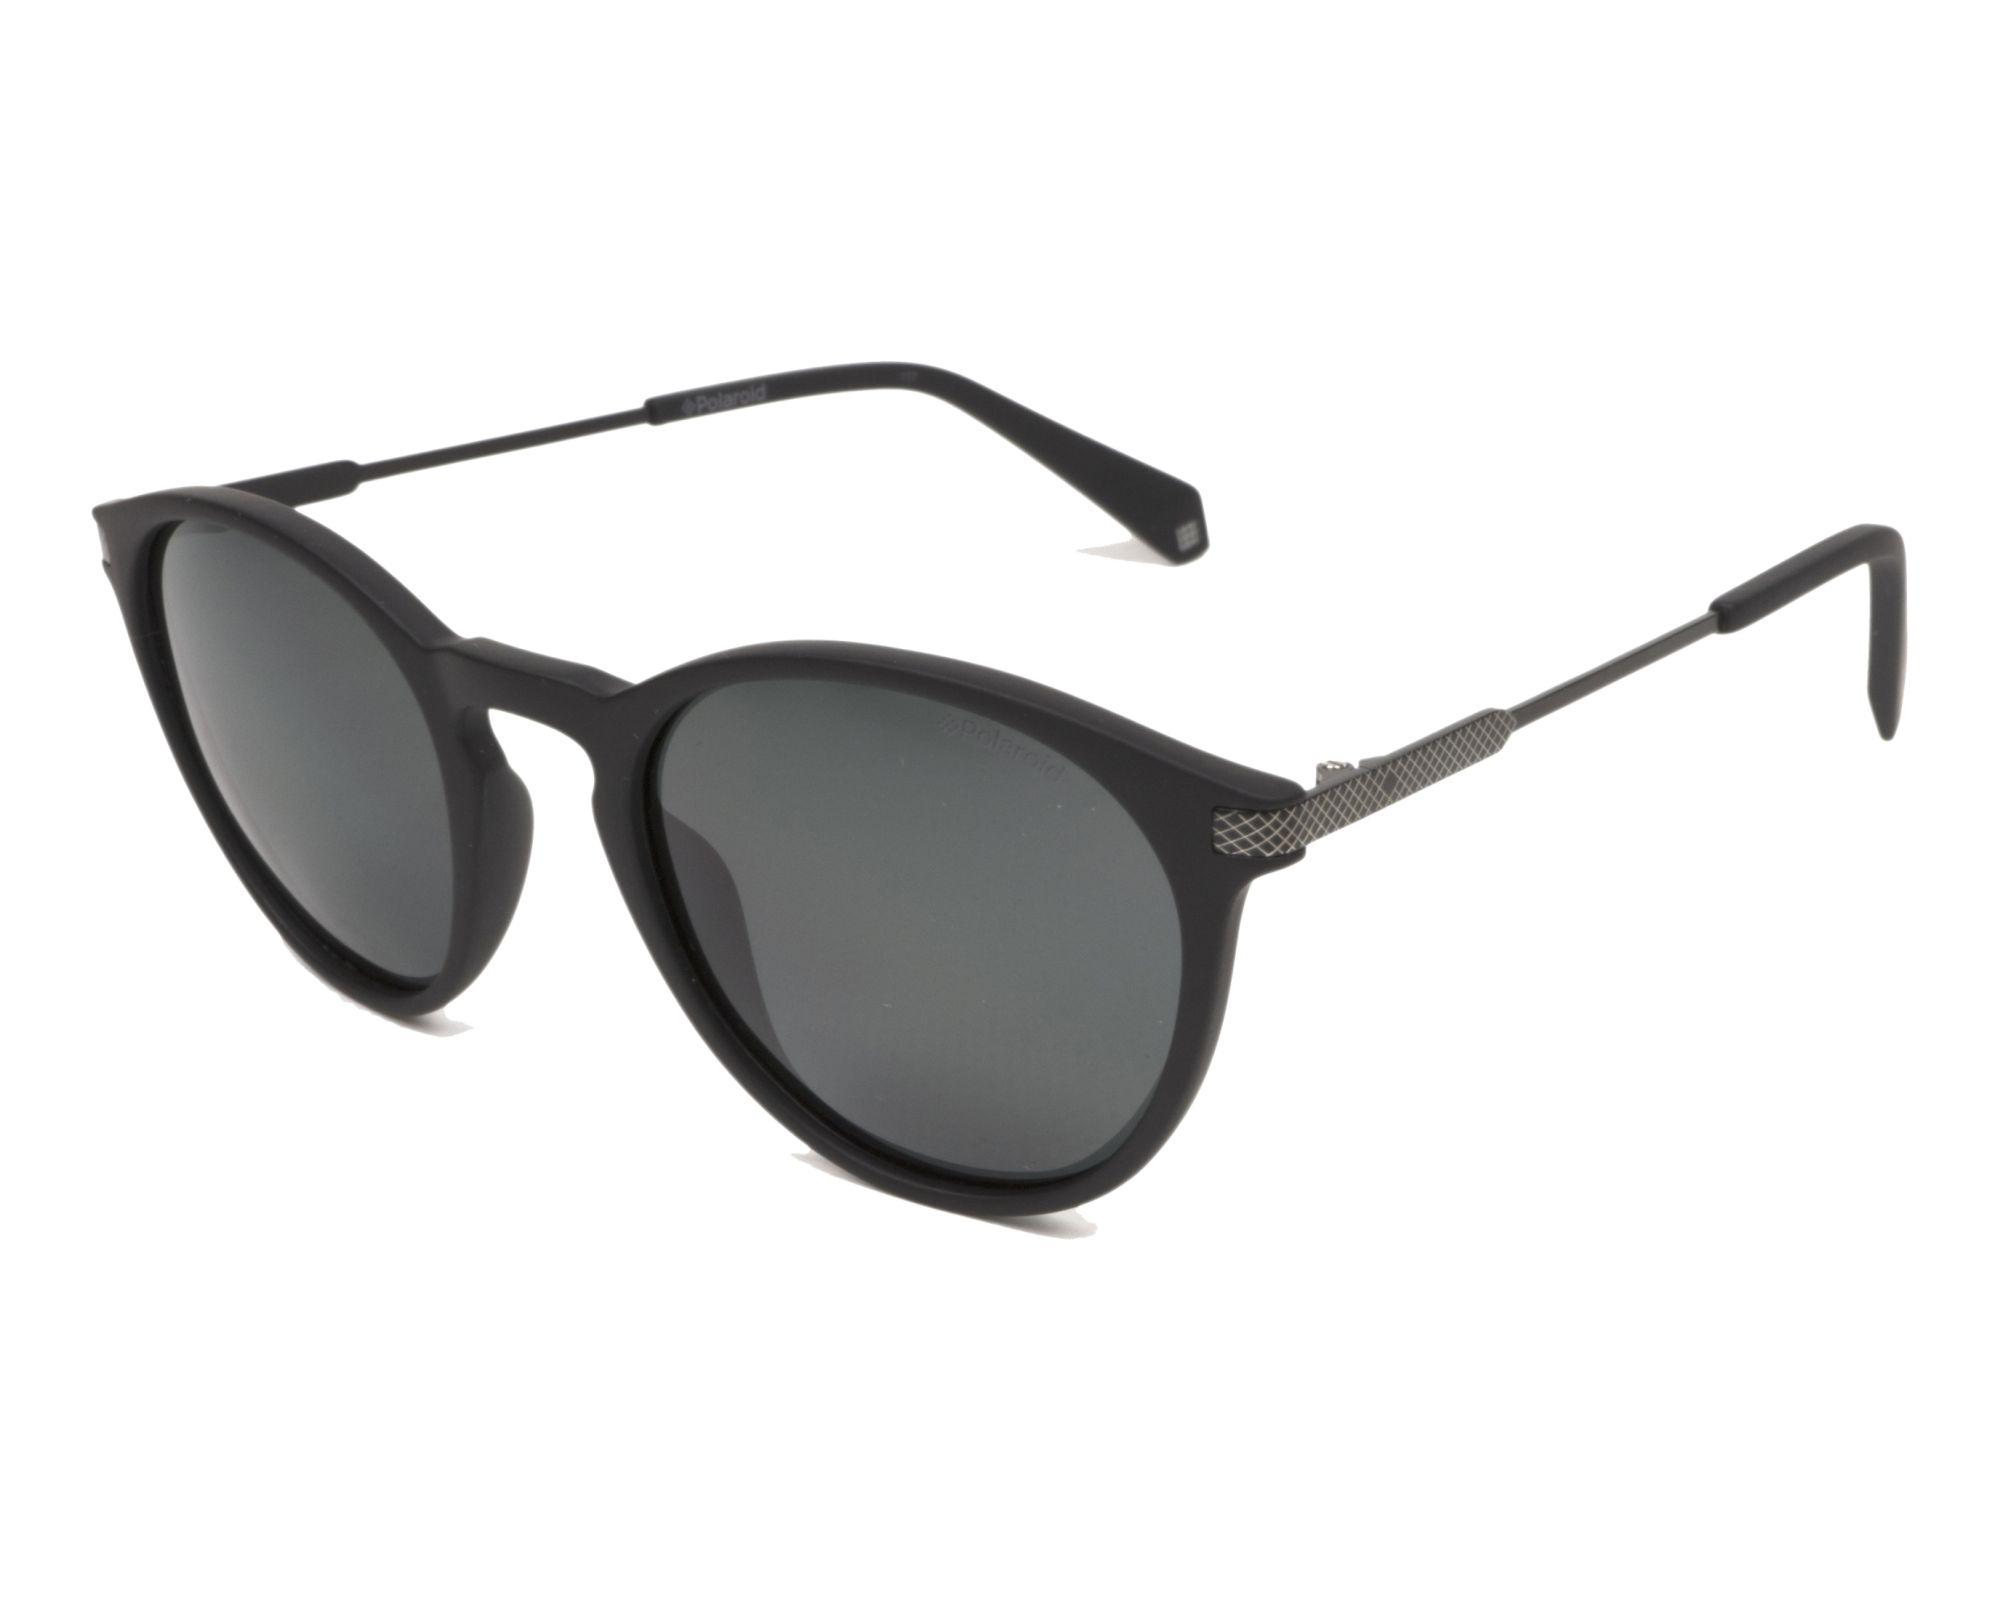 72232a332bd Sunglasses Polaroid PLD-2062-S 003 M9 50-22 Black Gun profile